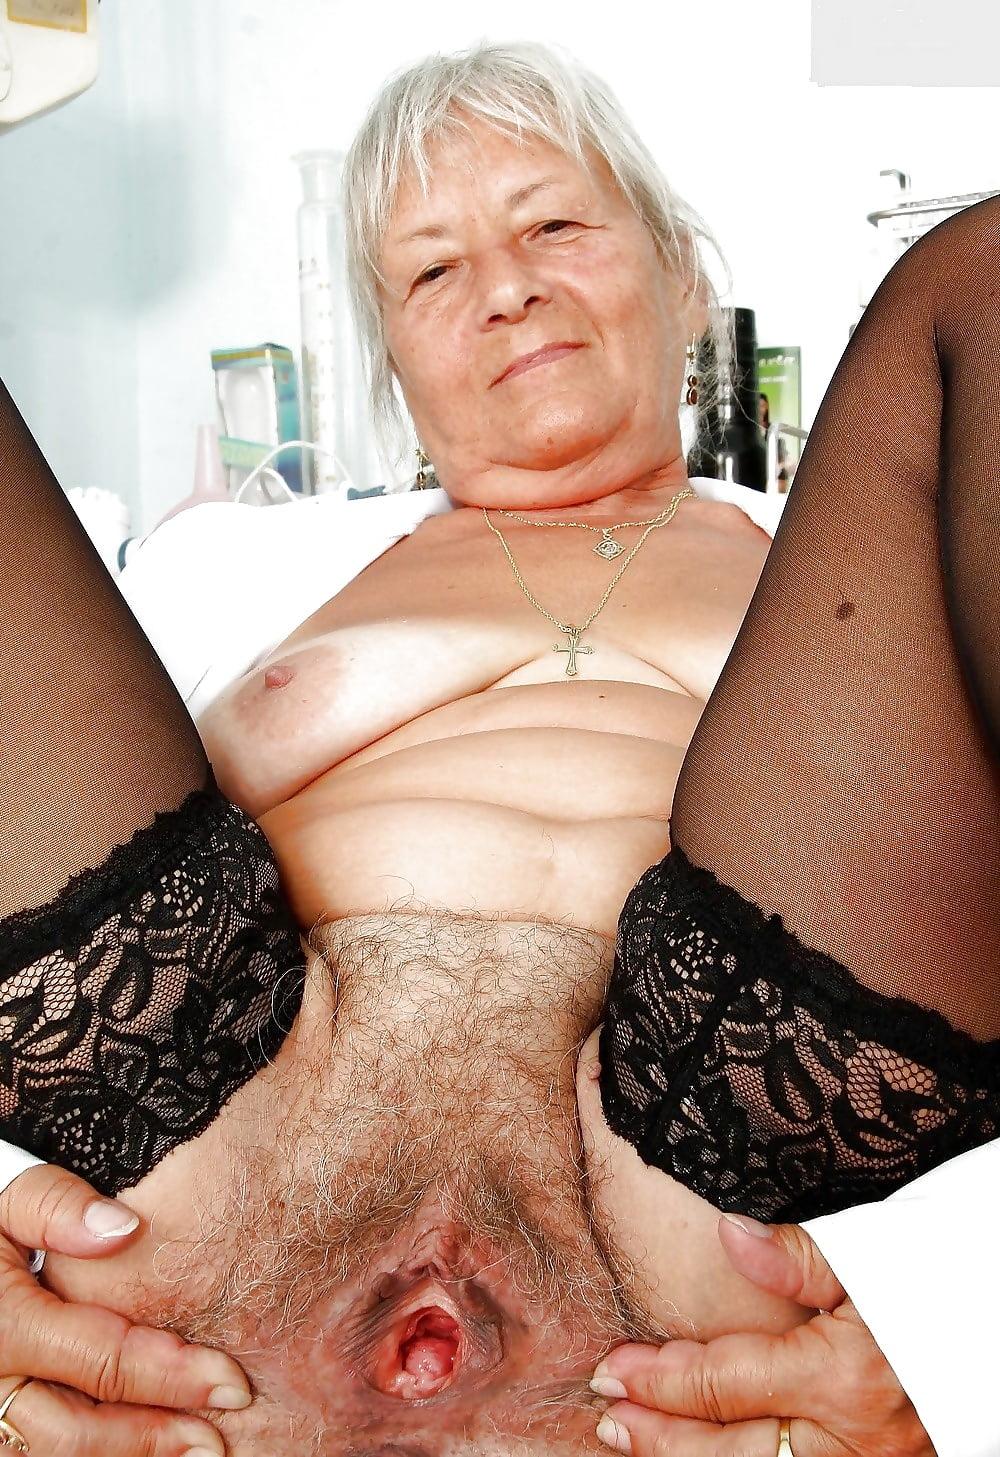 mallu-old-pussy-granny-thumbs-garcia-nude